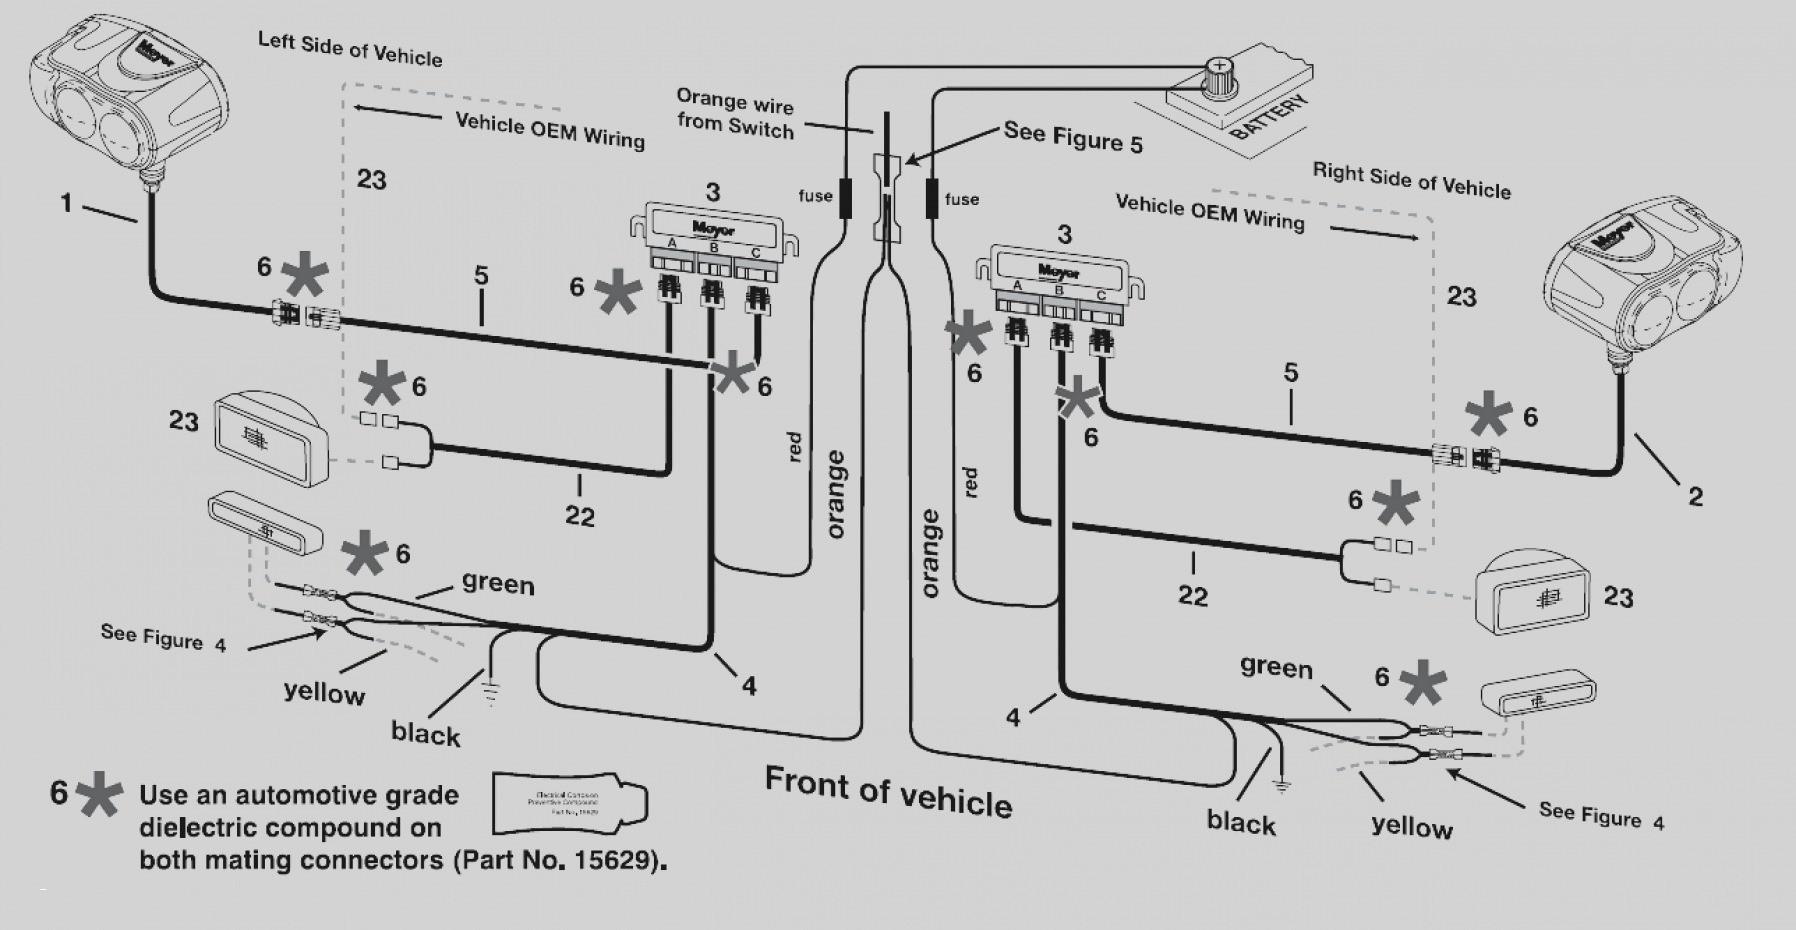 Fisher Plow Wiring Diagram New Latest Western Plows Wiring Diagram Blizzard Snow Plow Diagrams